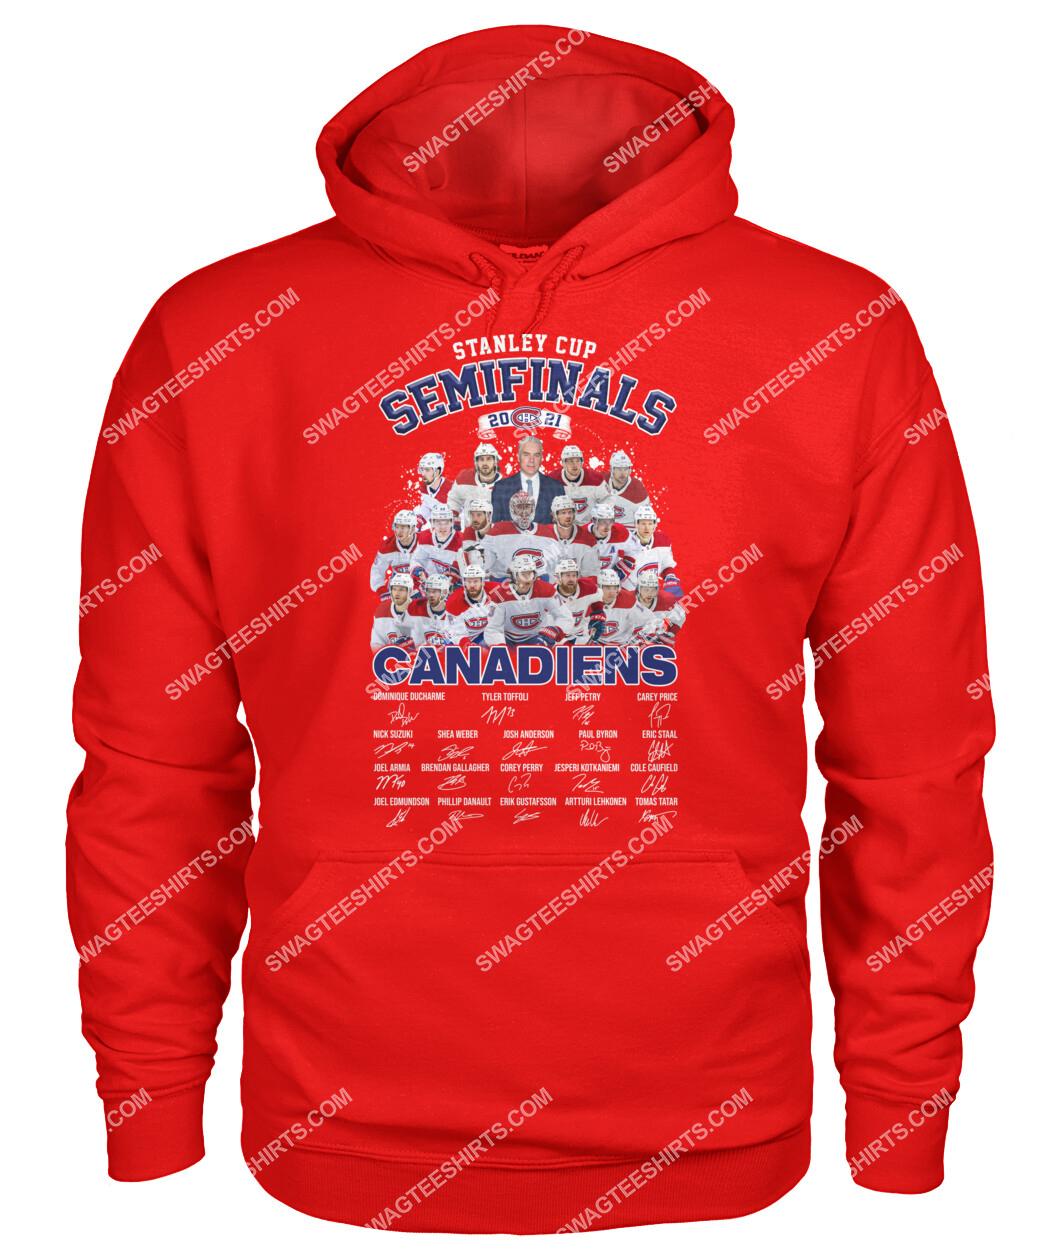 astanley cup semifinals 2021 montreal canadiens signatures hoodie 1